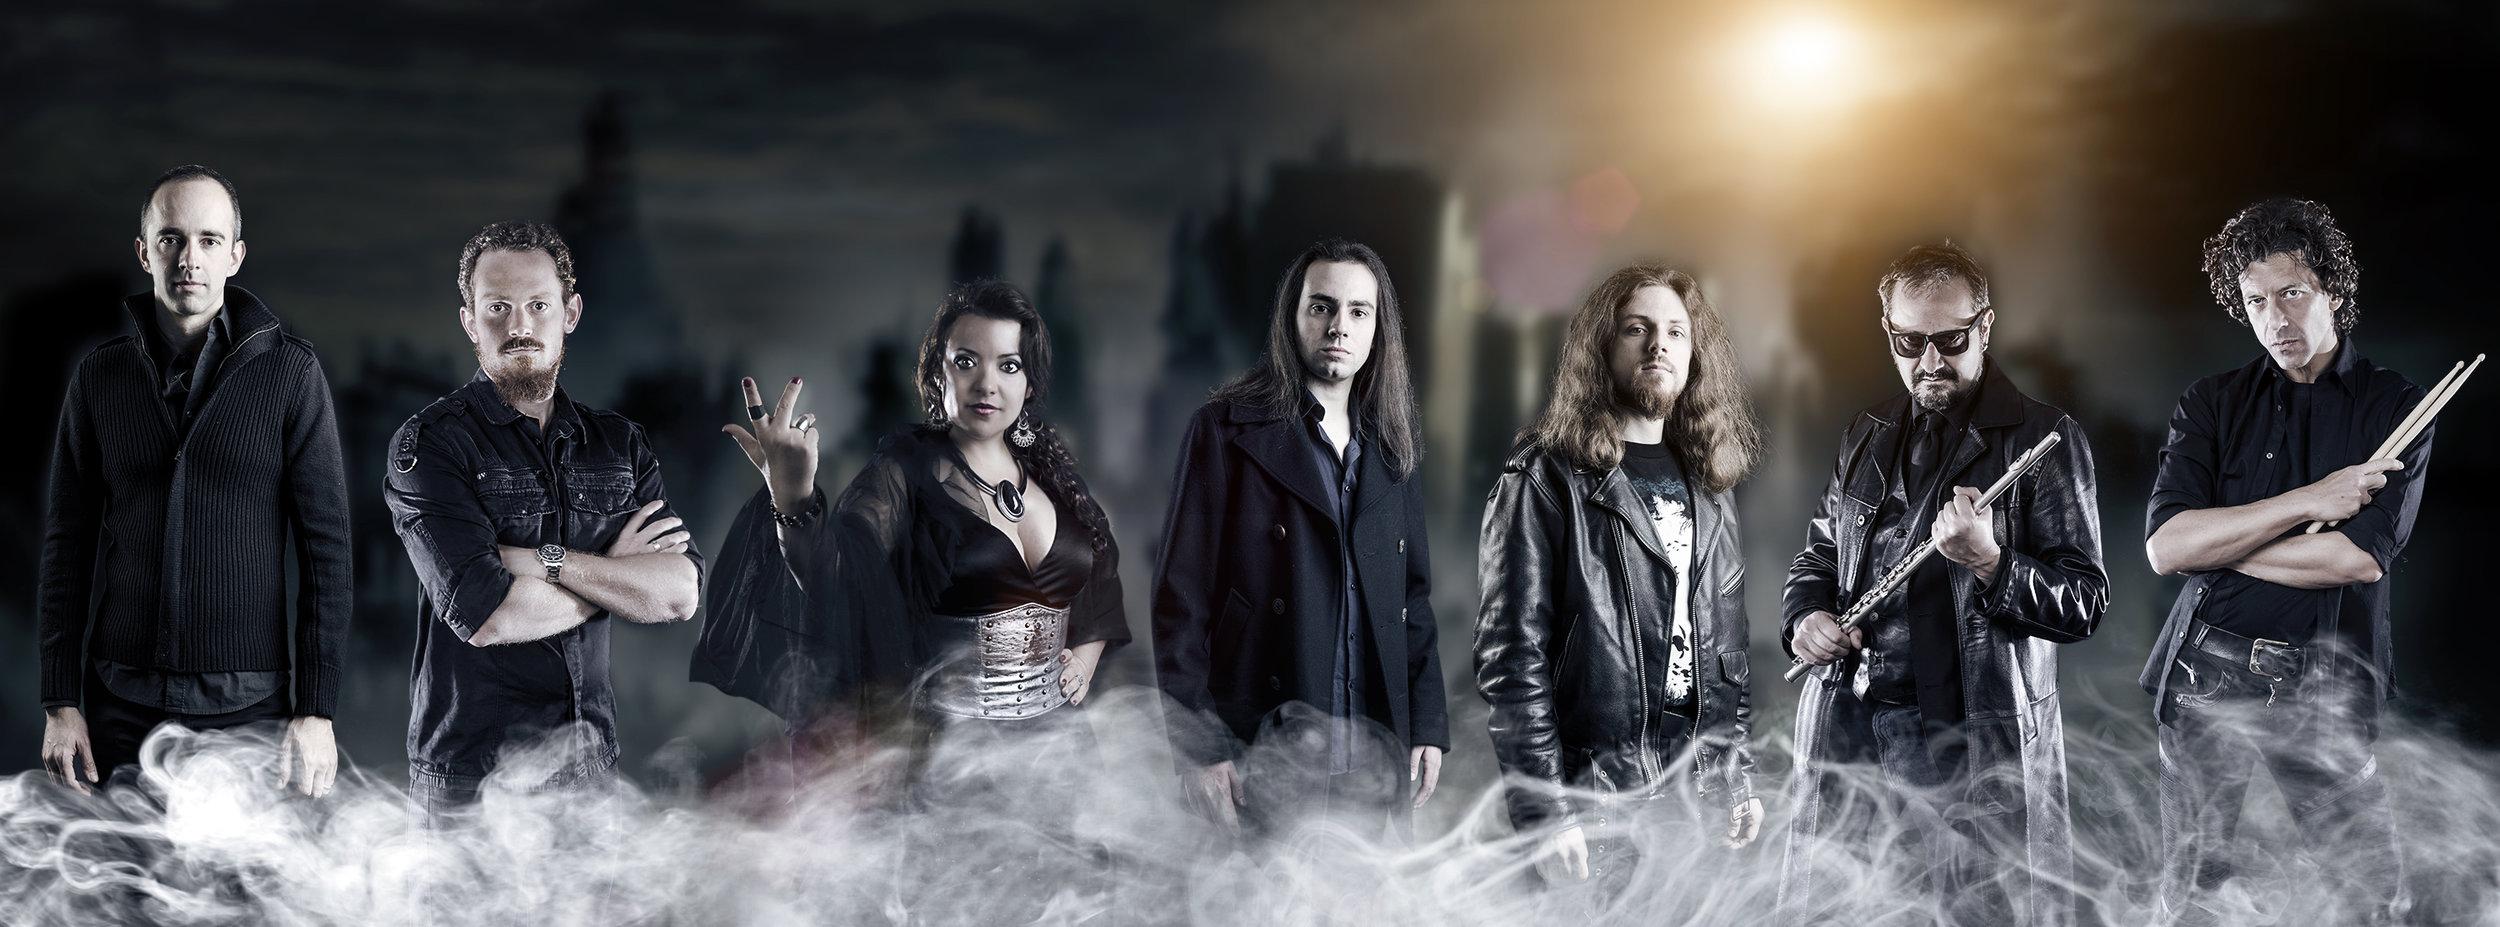 cover facebook foto band metal milano